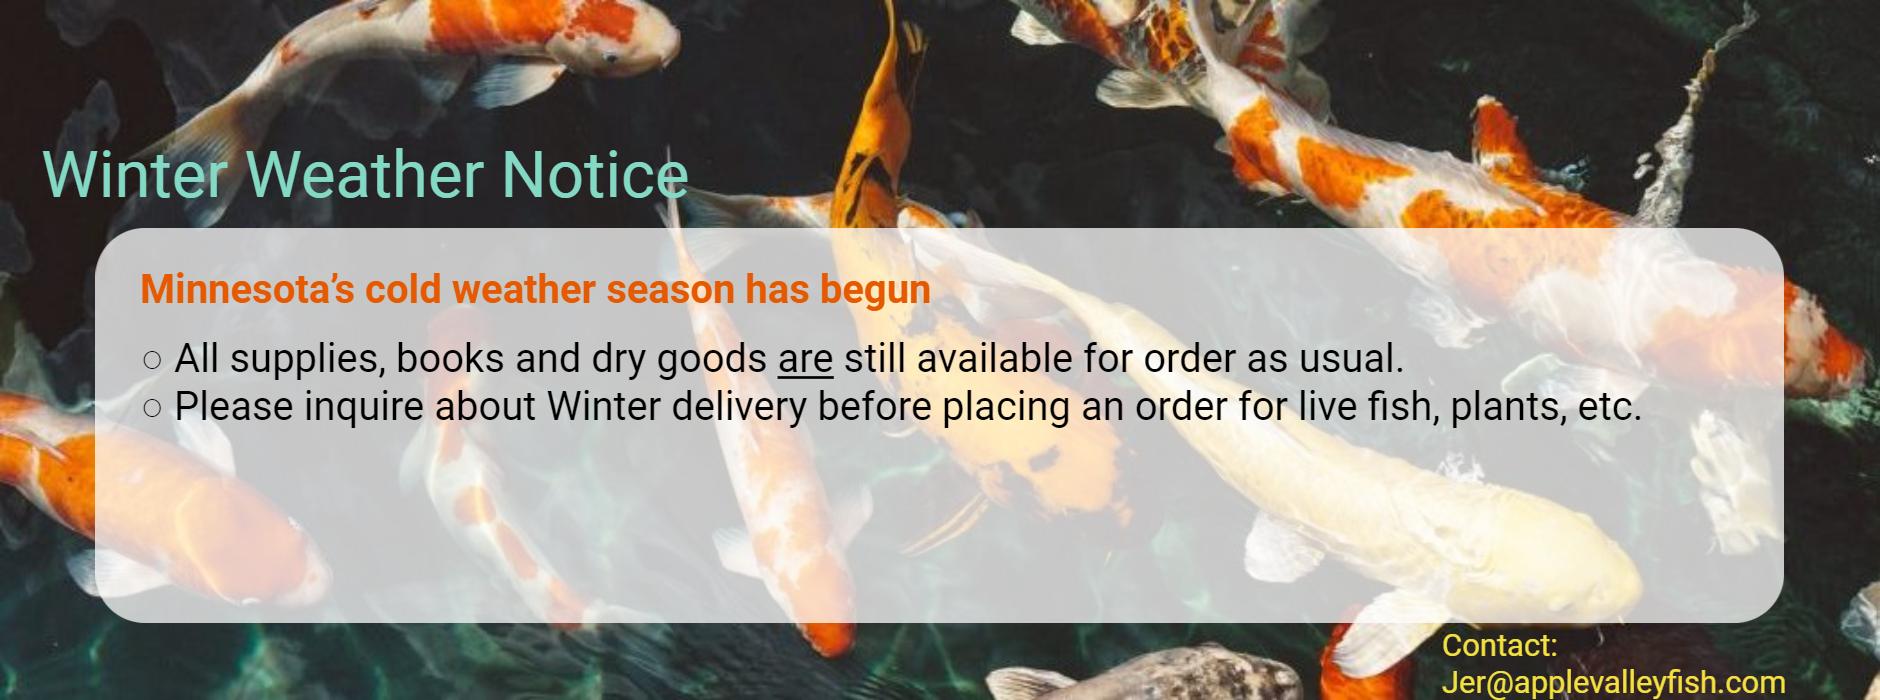 20201201 - Winter Weather Notice